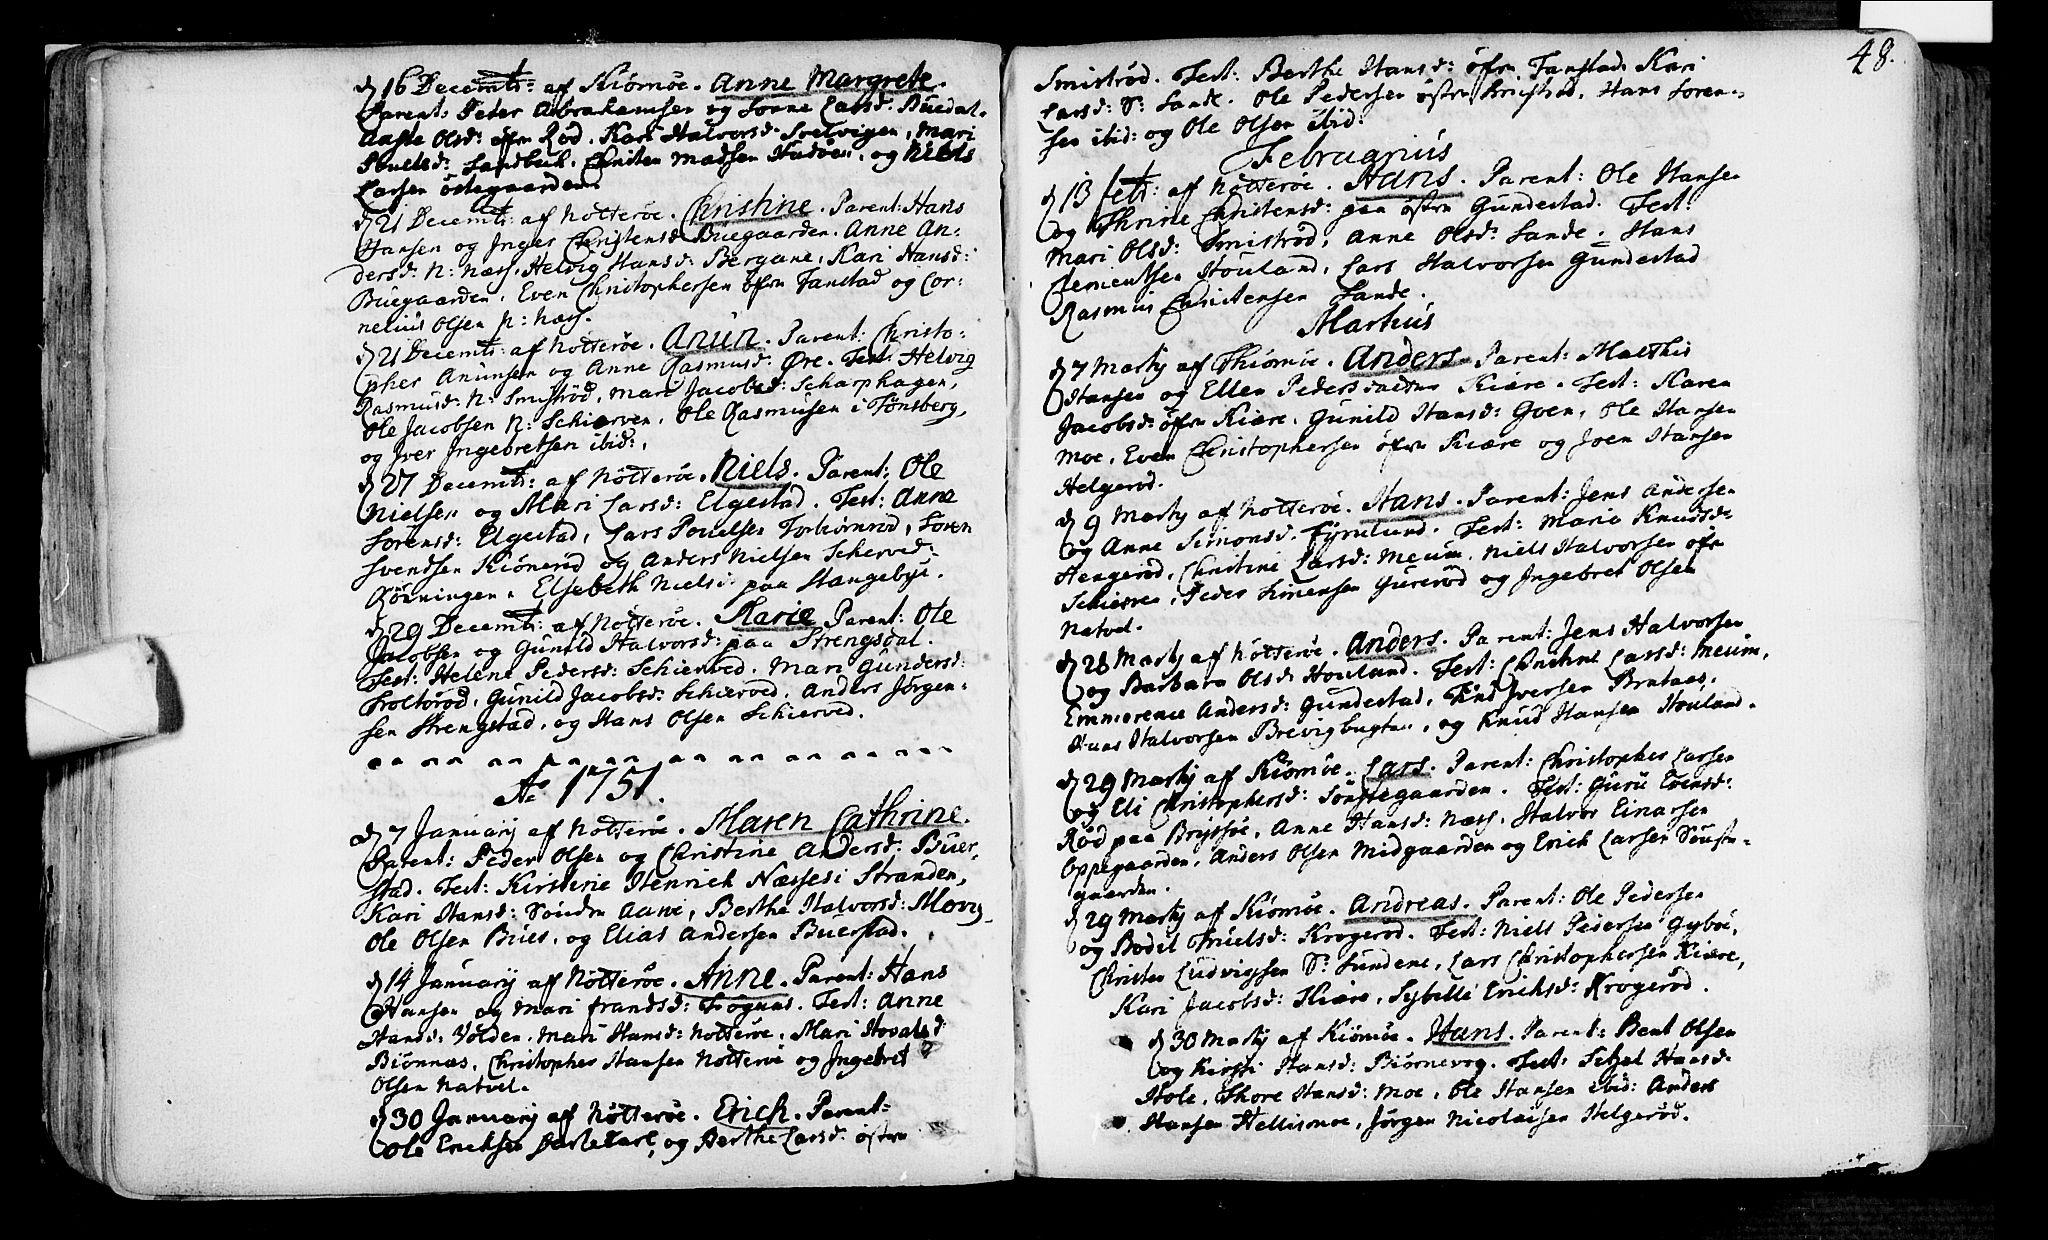 SAKO, Nøtterøy kirkebøker, F/Fa/L0002: Ministerialbok nr. I 2, 1738-1790, s. 48